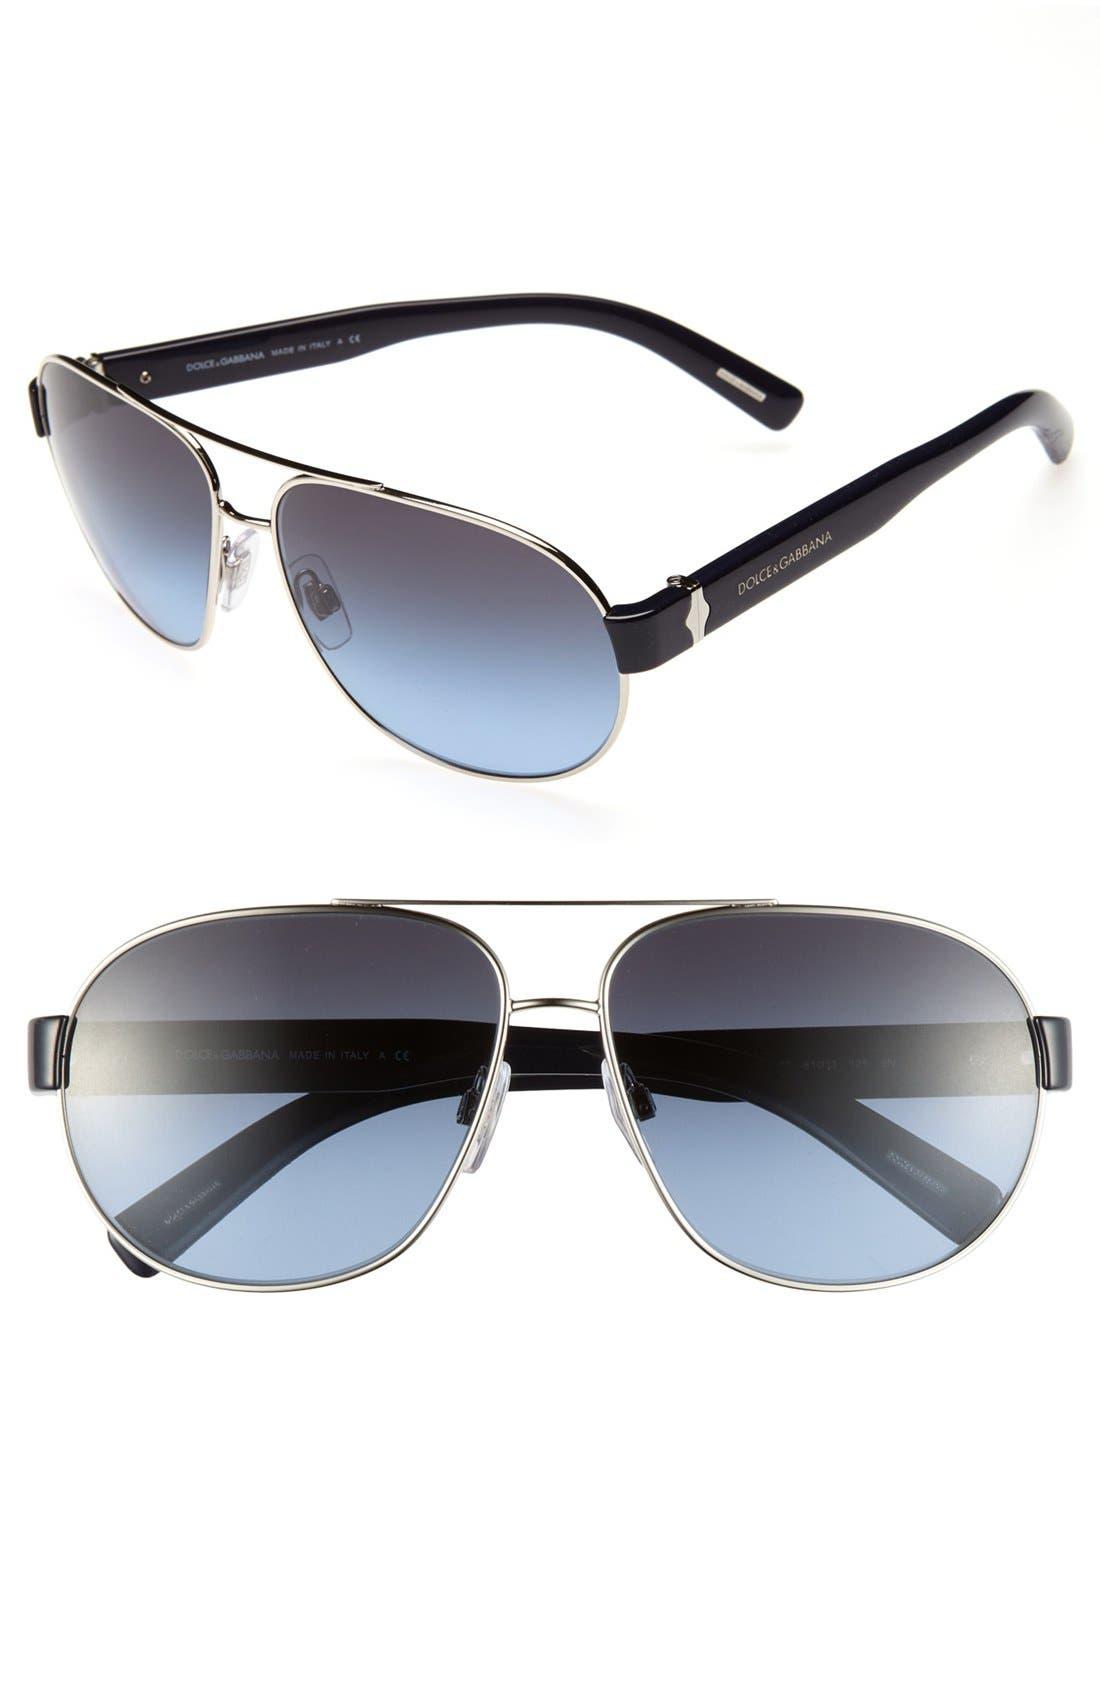 Alternate Image 1 Selected - Dolce&Gabbana 61mm Aviator Sunglasses